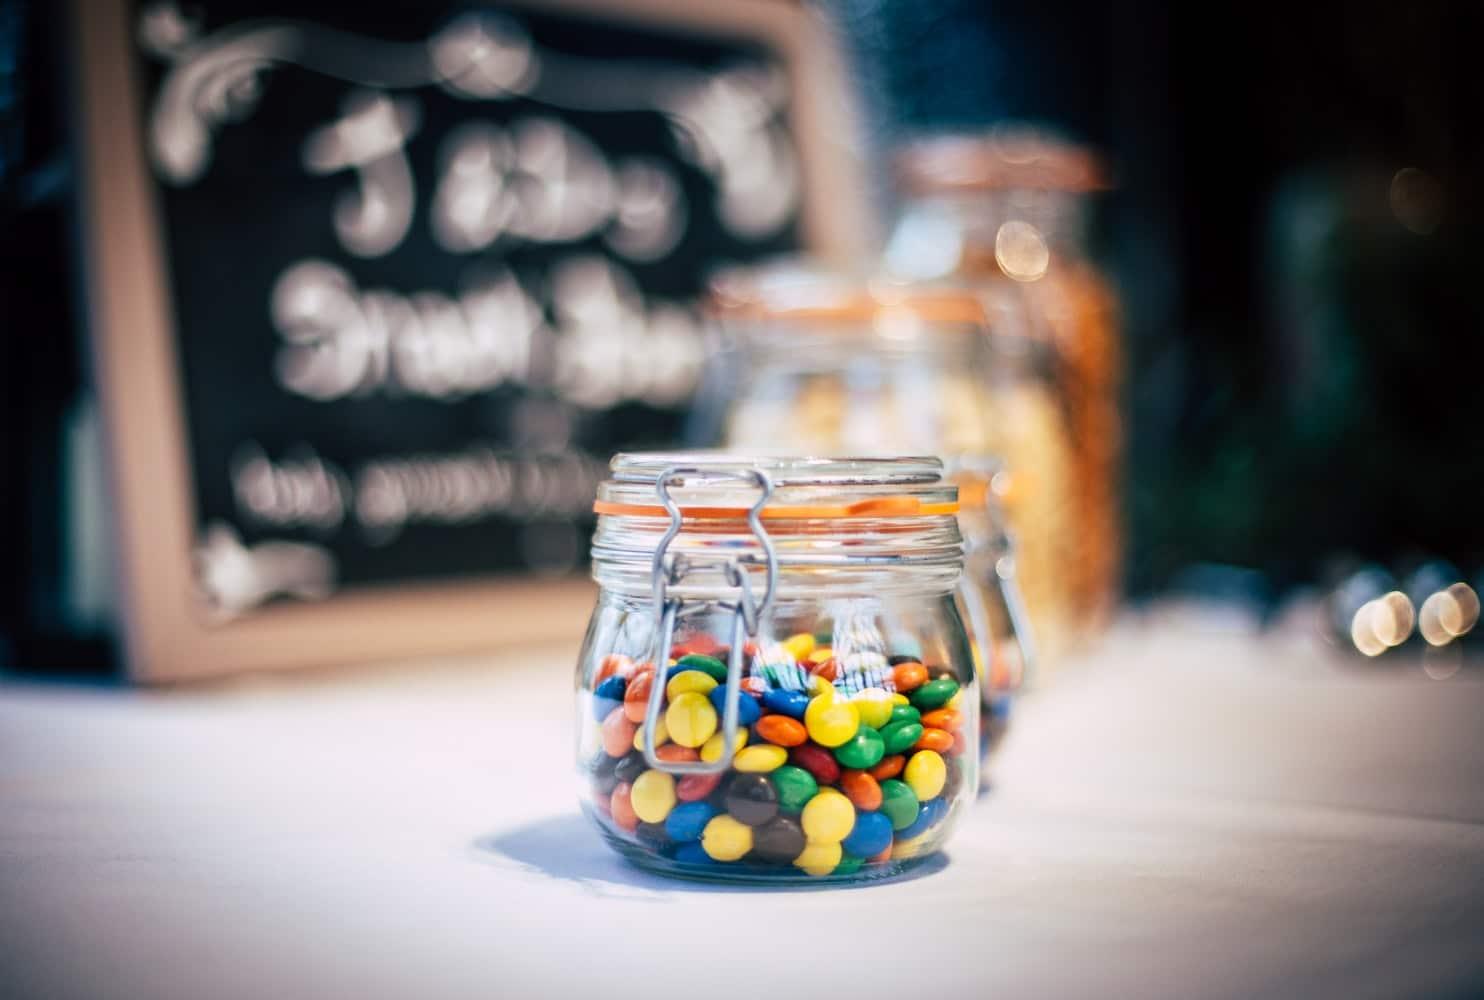 bocal de bonbons enfants aliments en vrac